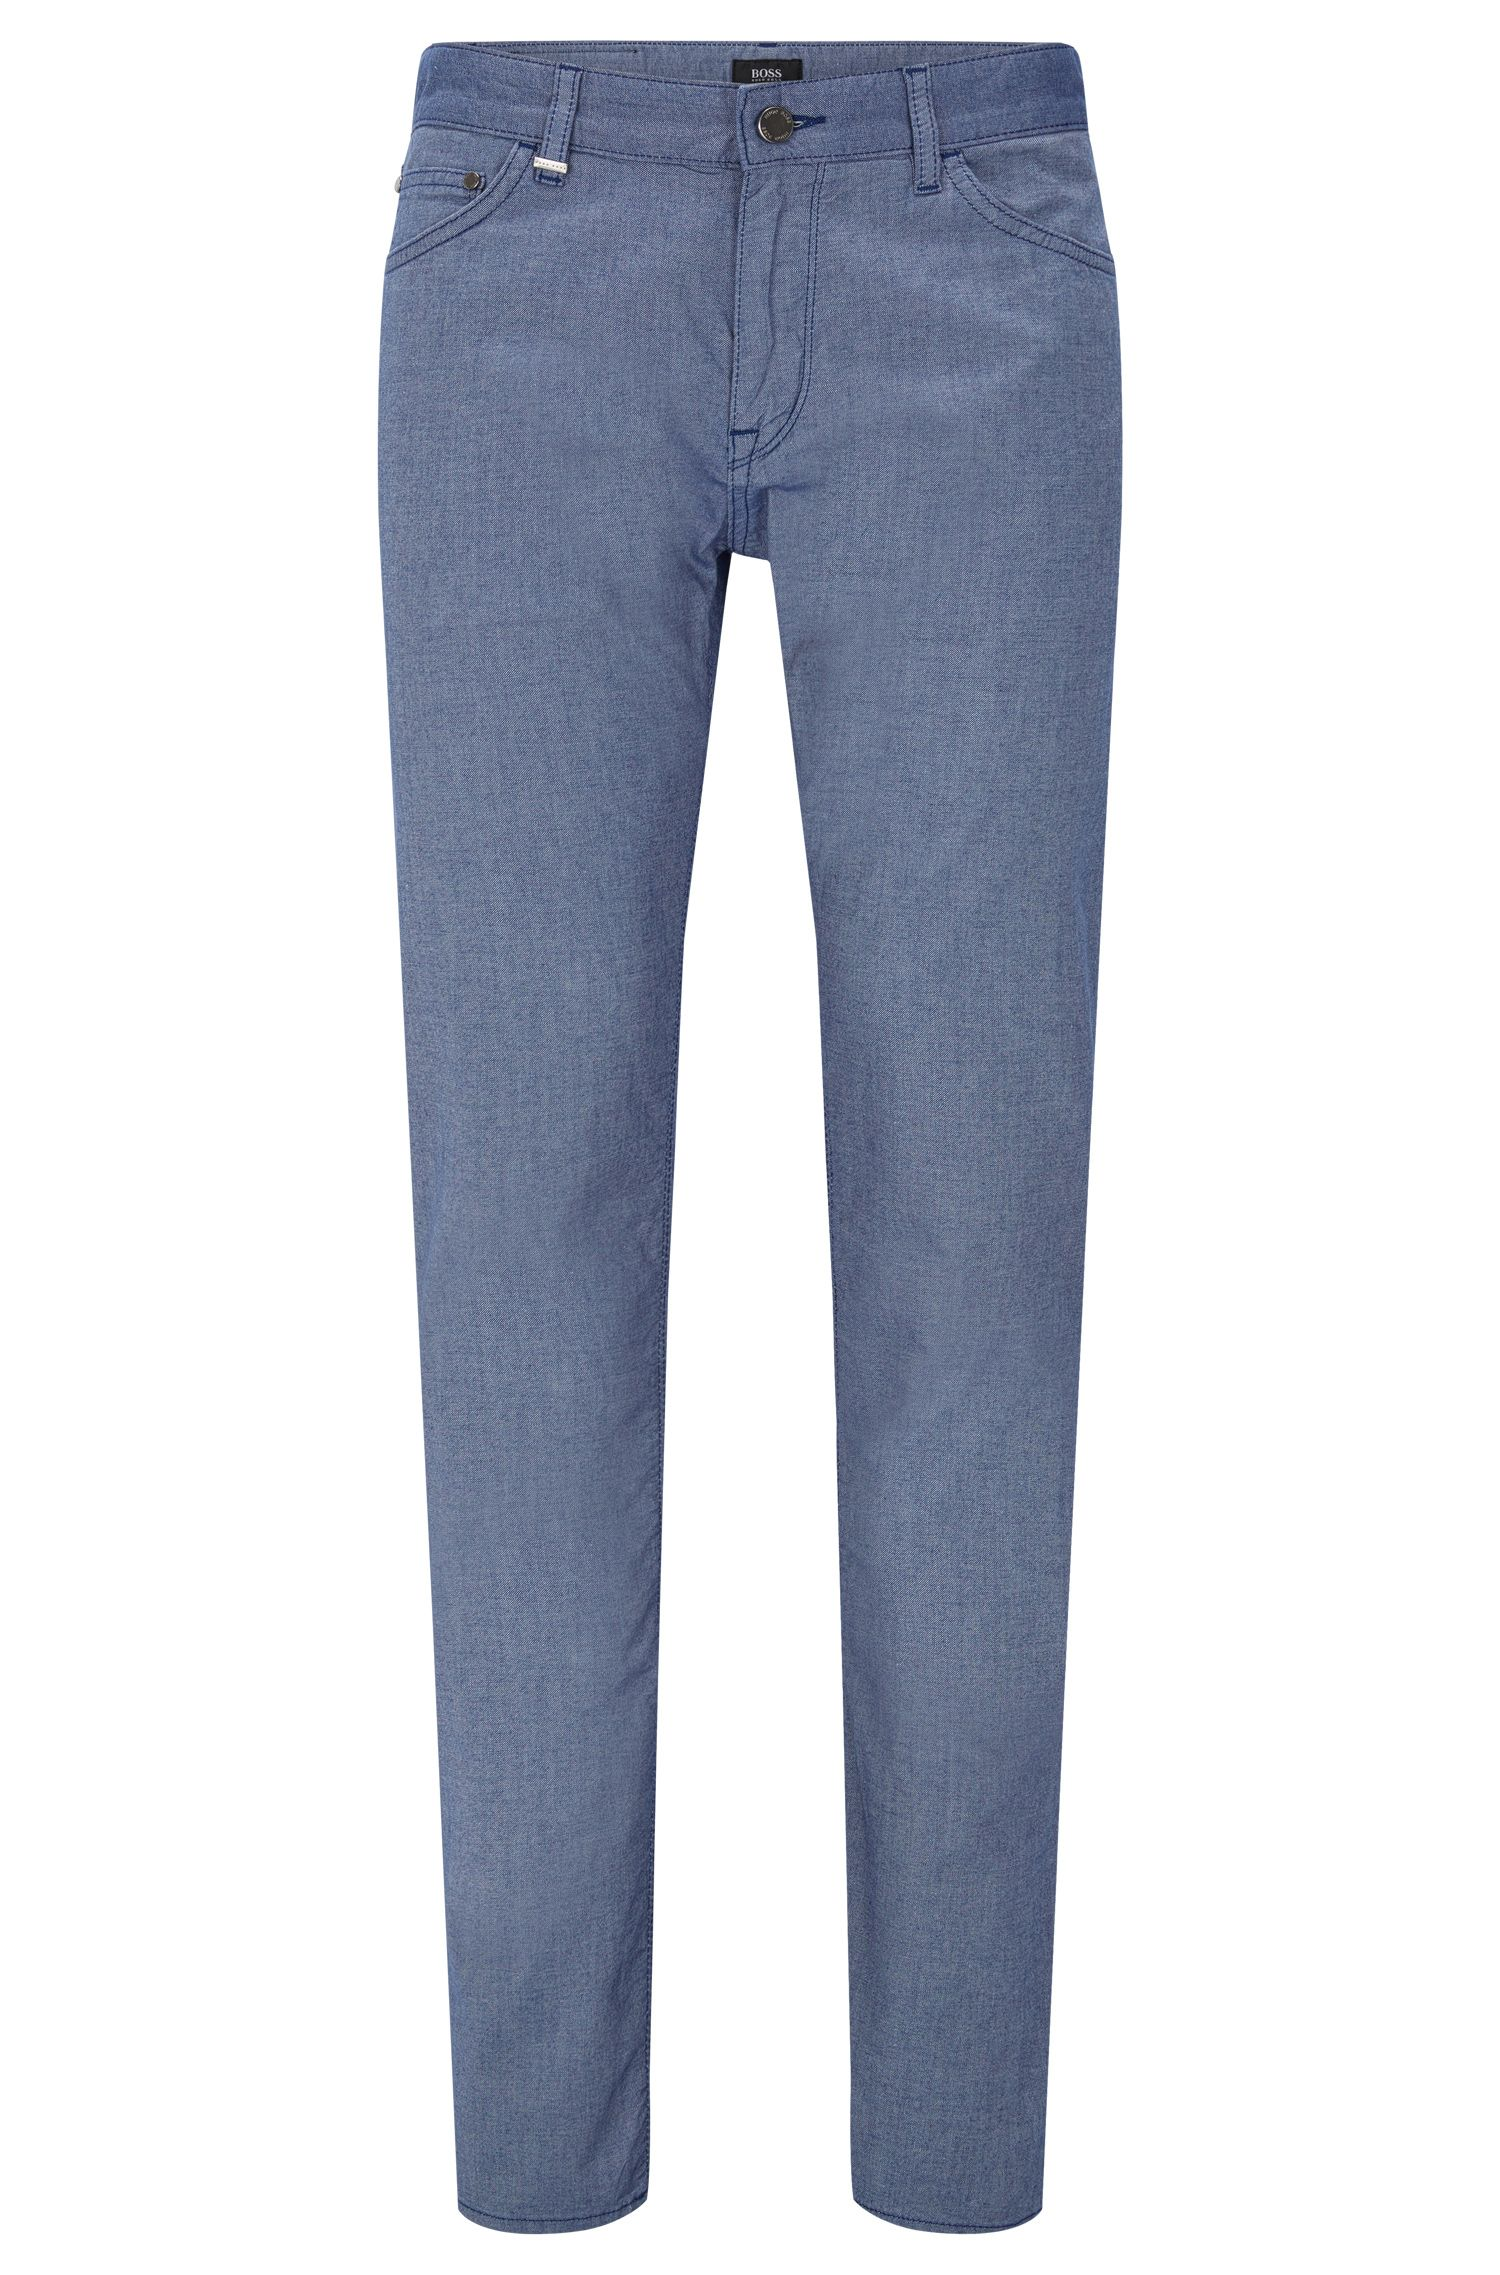 11.6 oz Stretch Cotton Jeans, Regular Fit | Maine